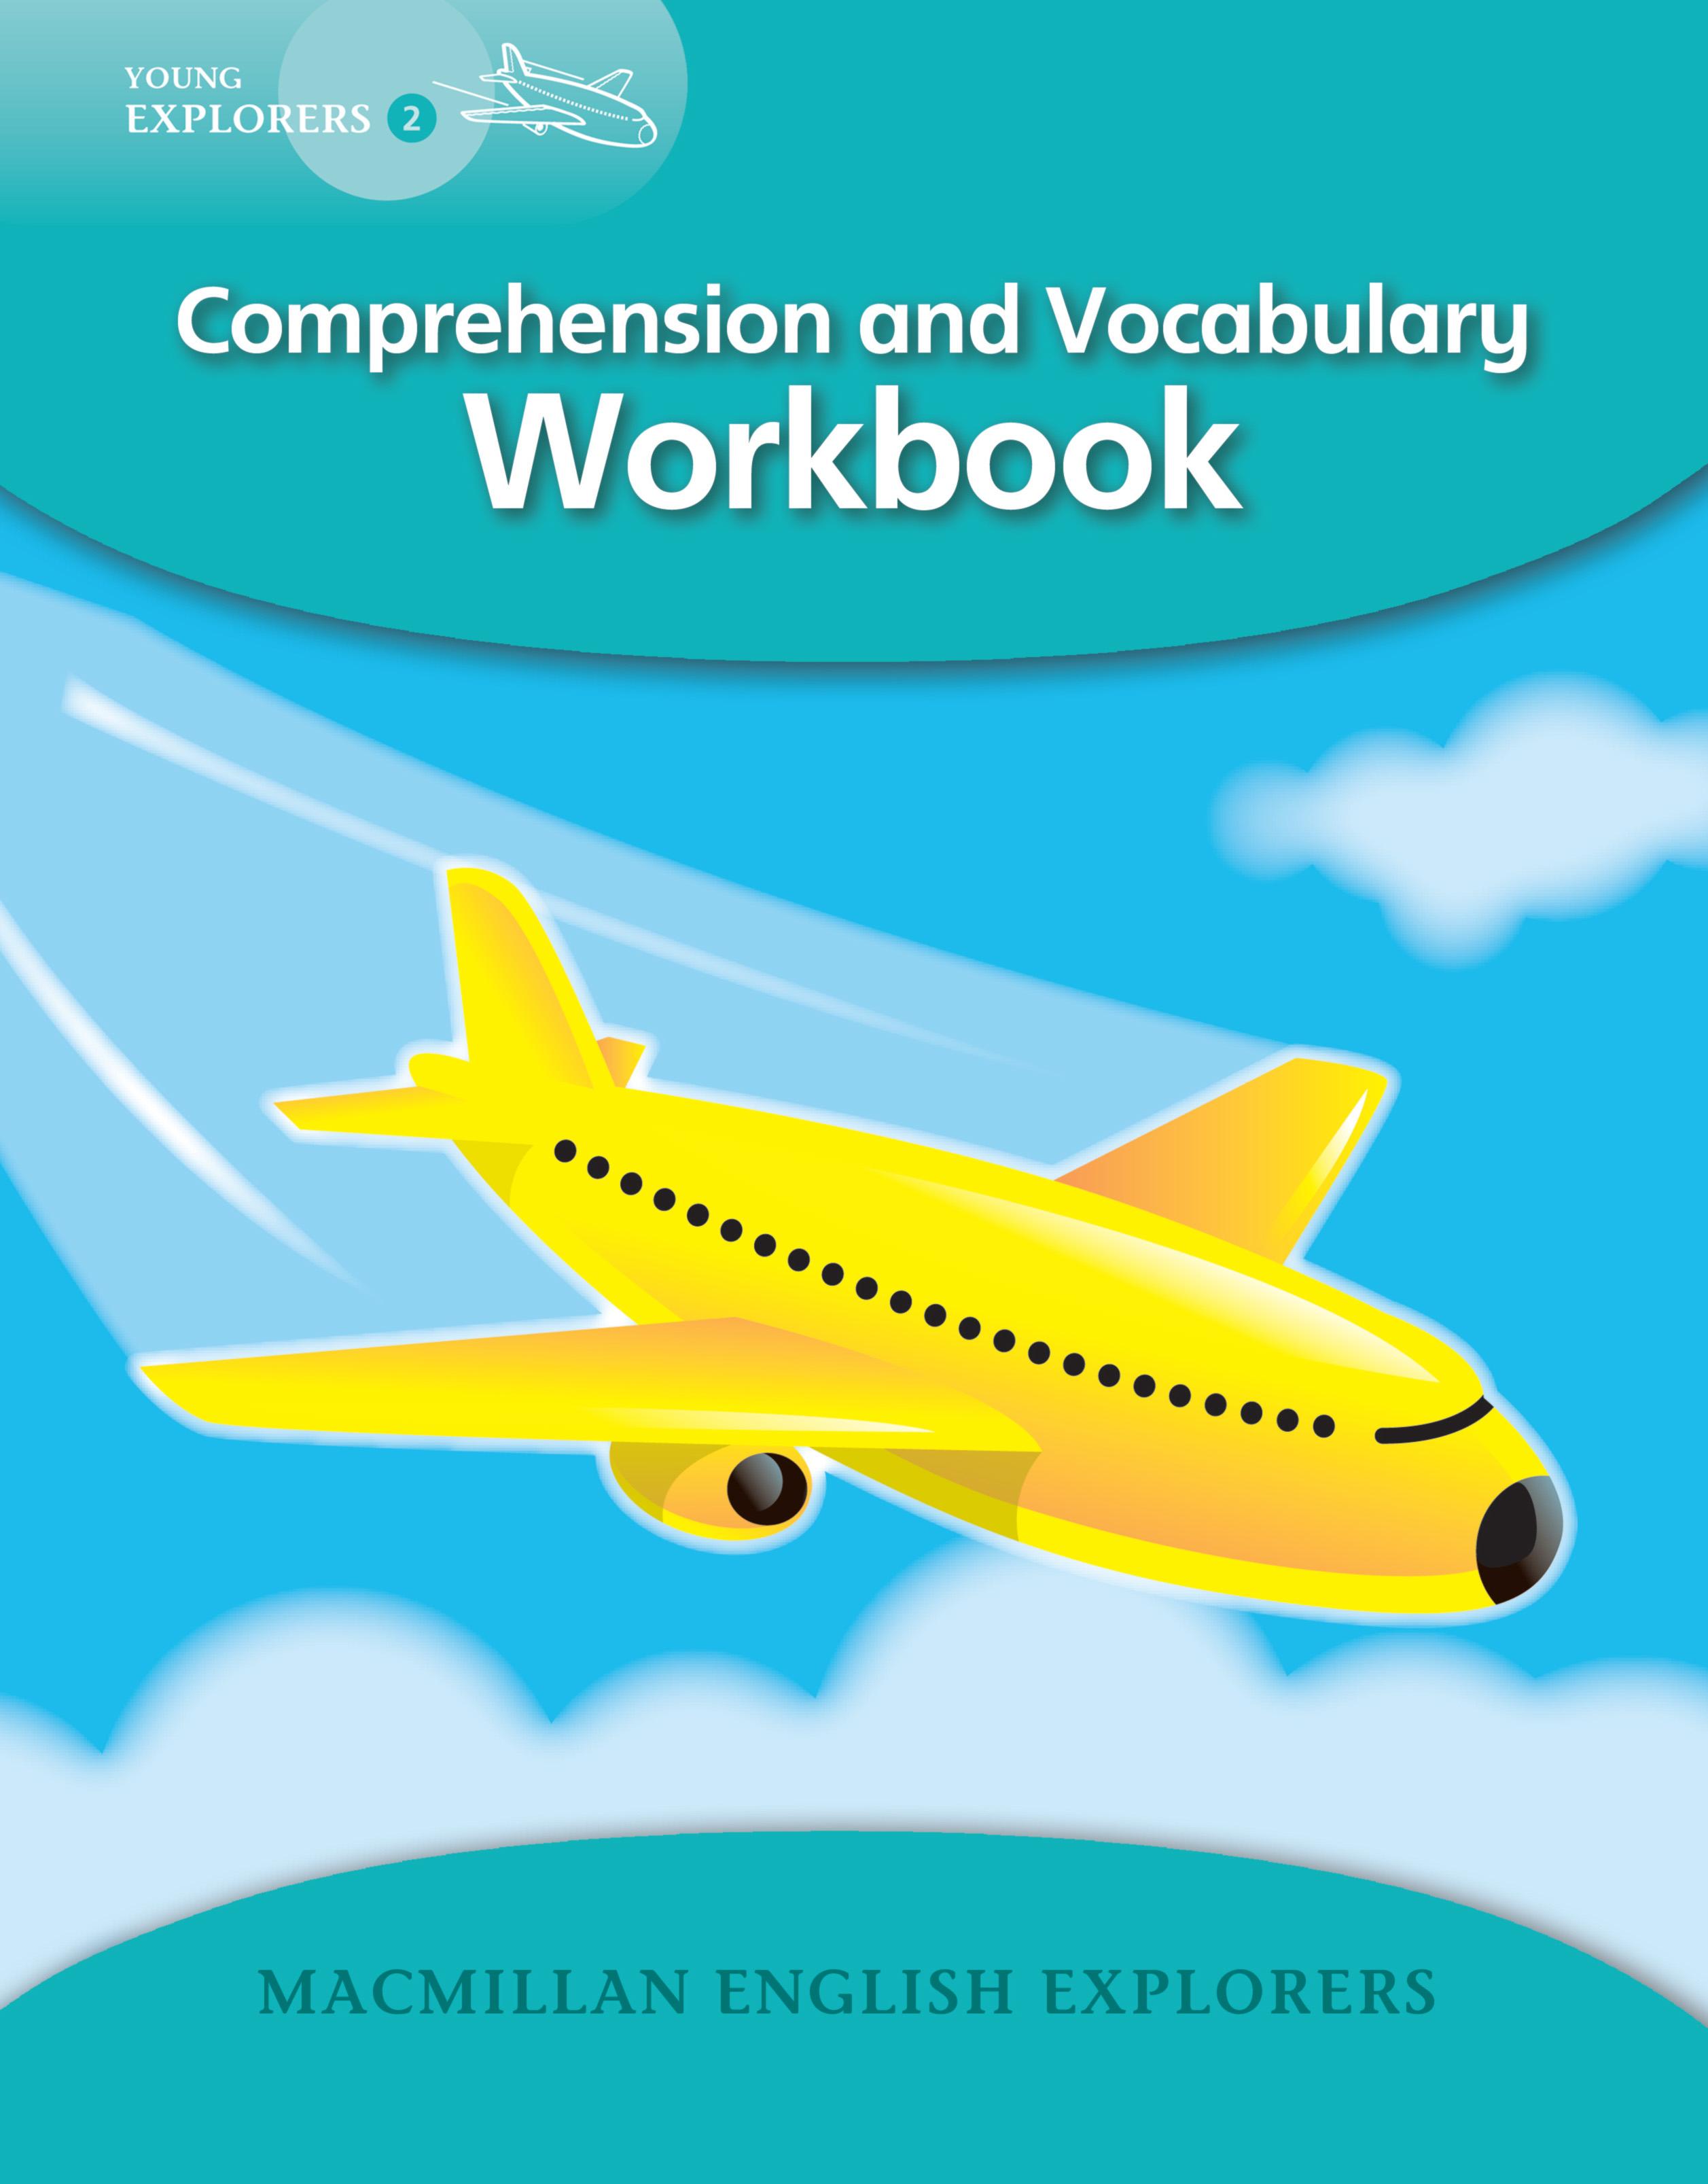 Young Explorers 2: Comprehension Workbook